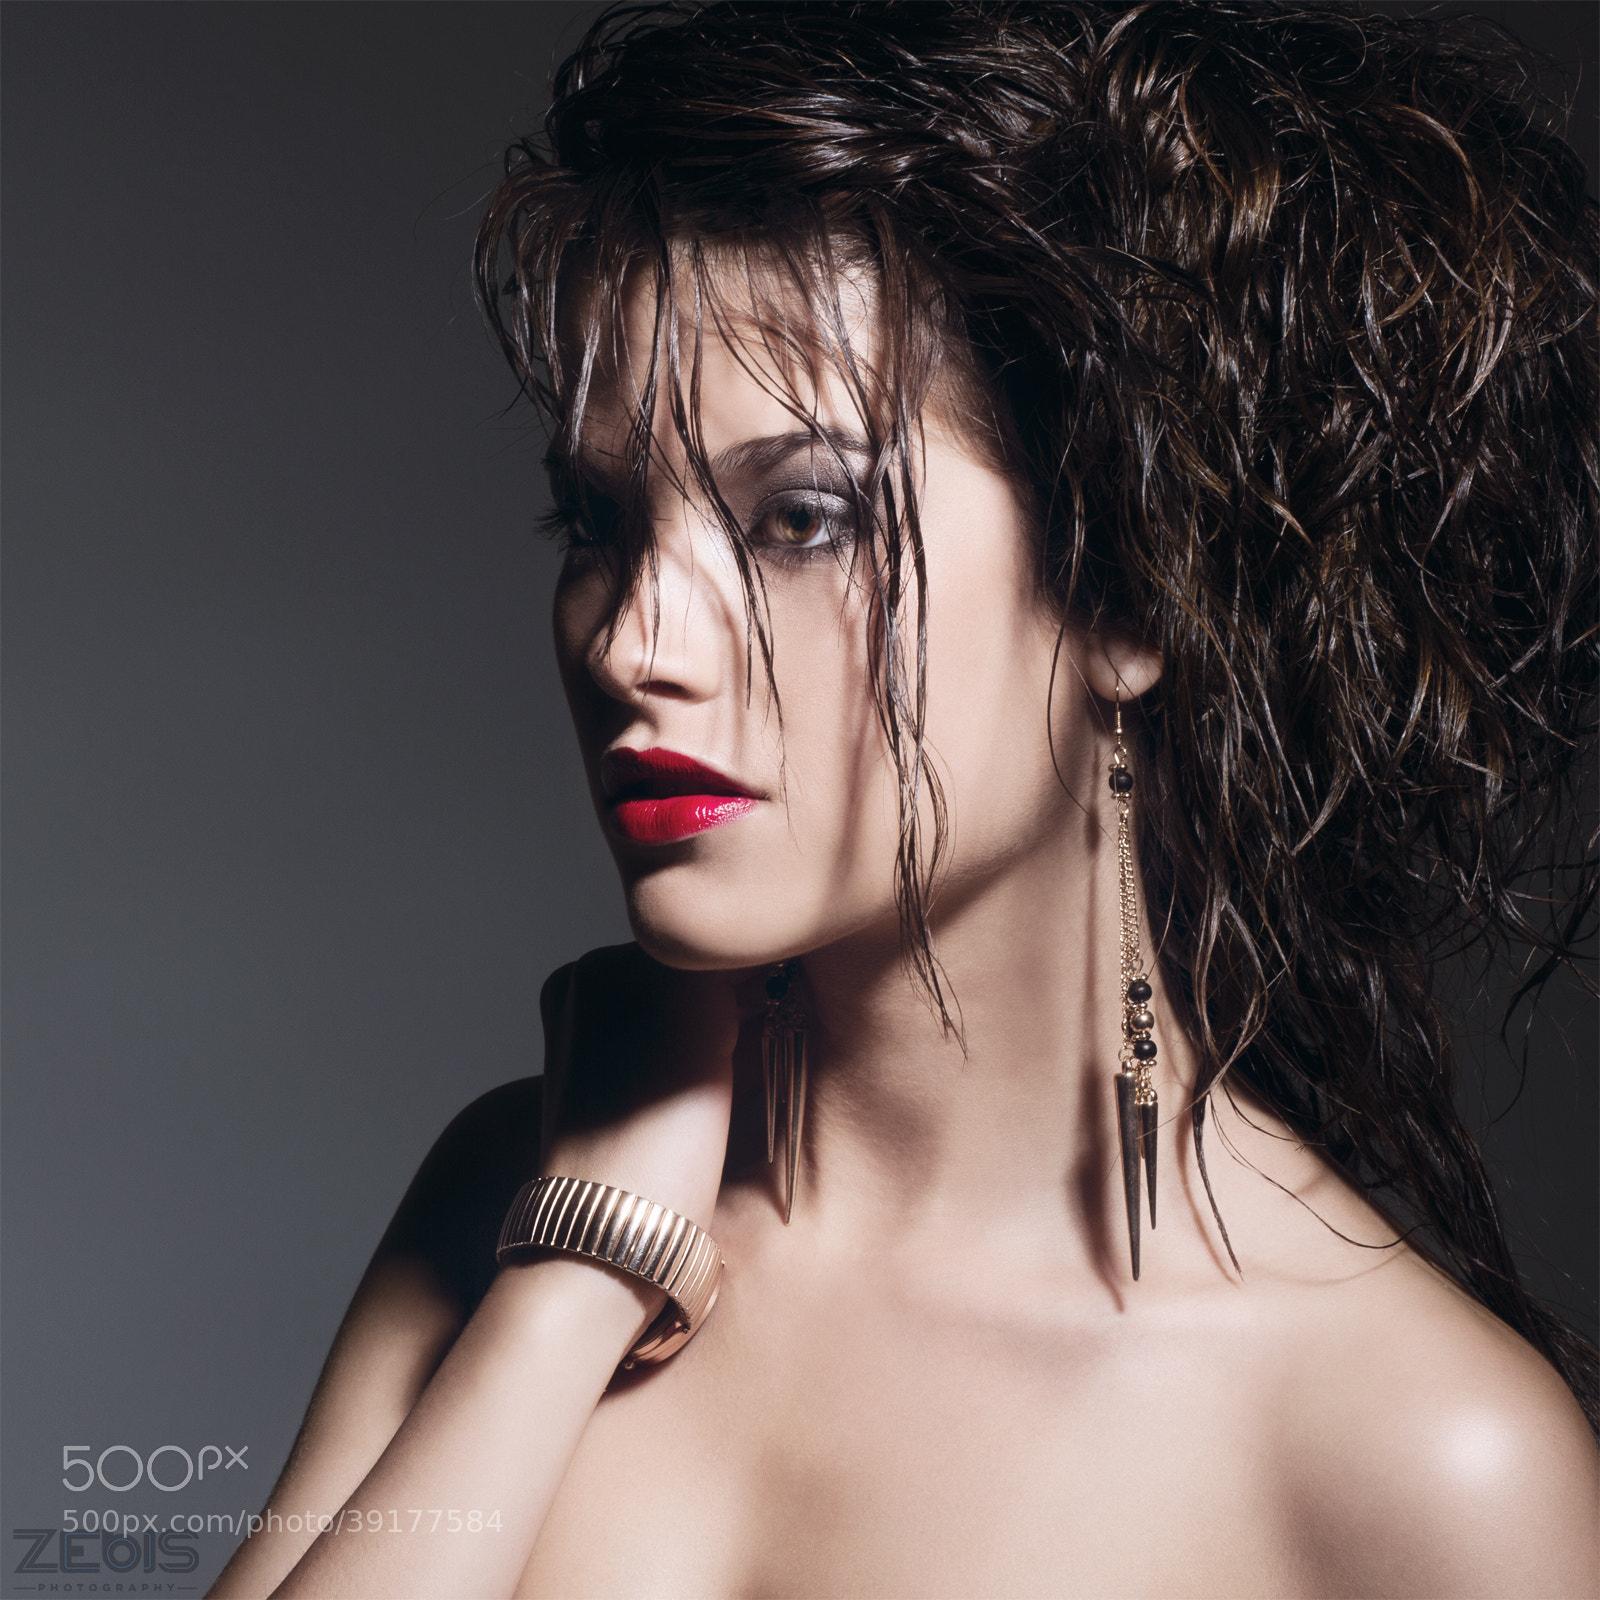 Photograph Portrait by Zebis Photography on 500px